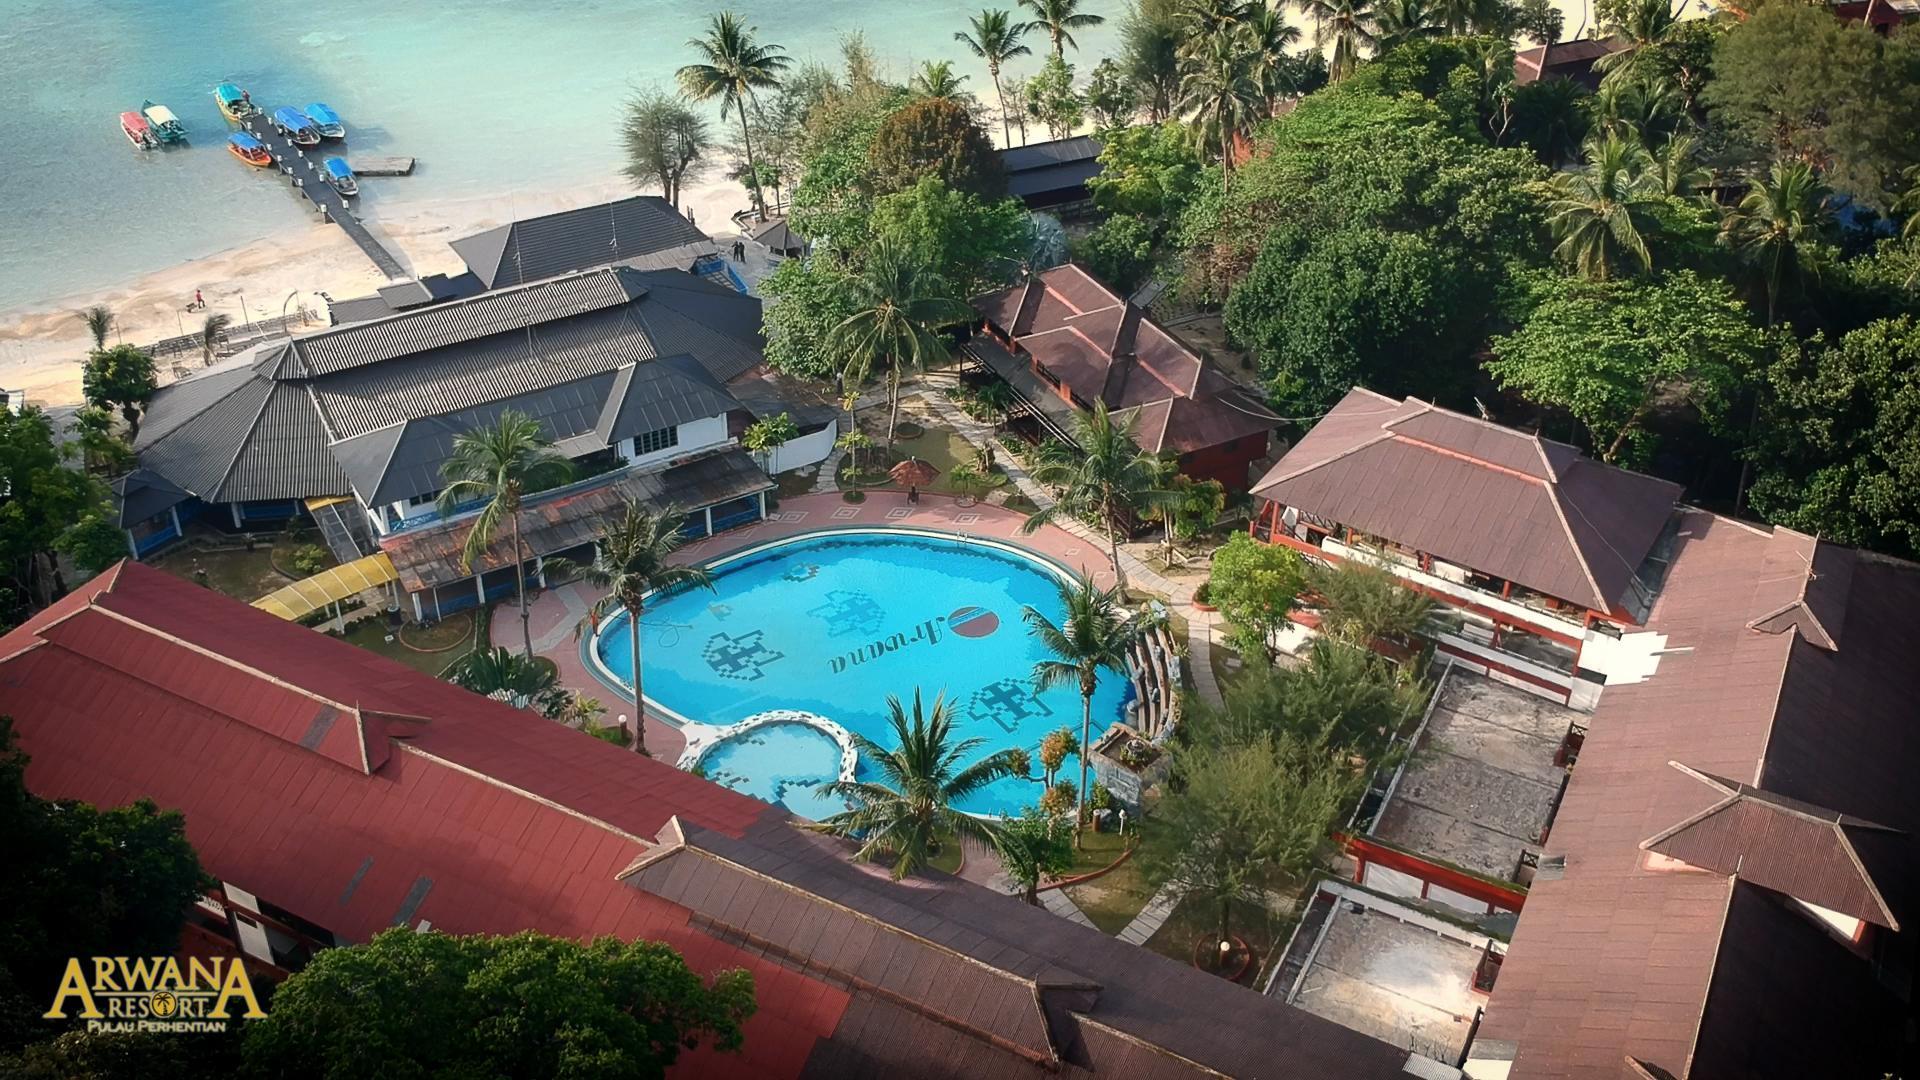 Arwana Perhentian Eco Resort & Beach Chalet, Besut